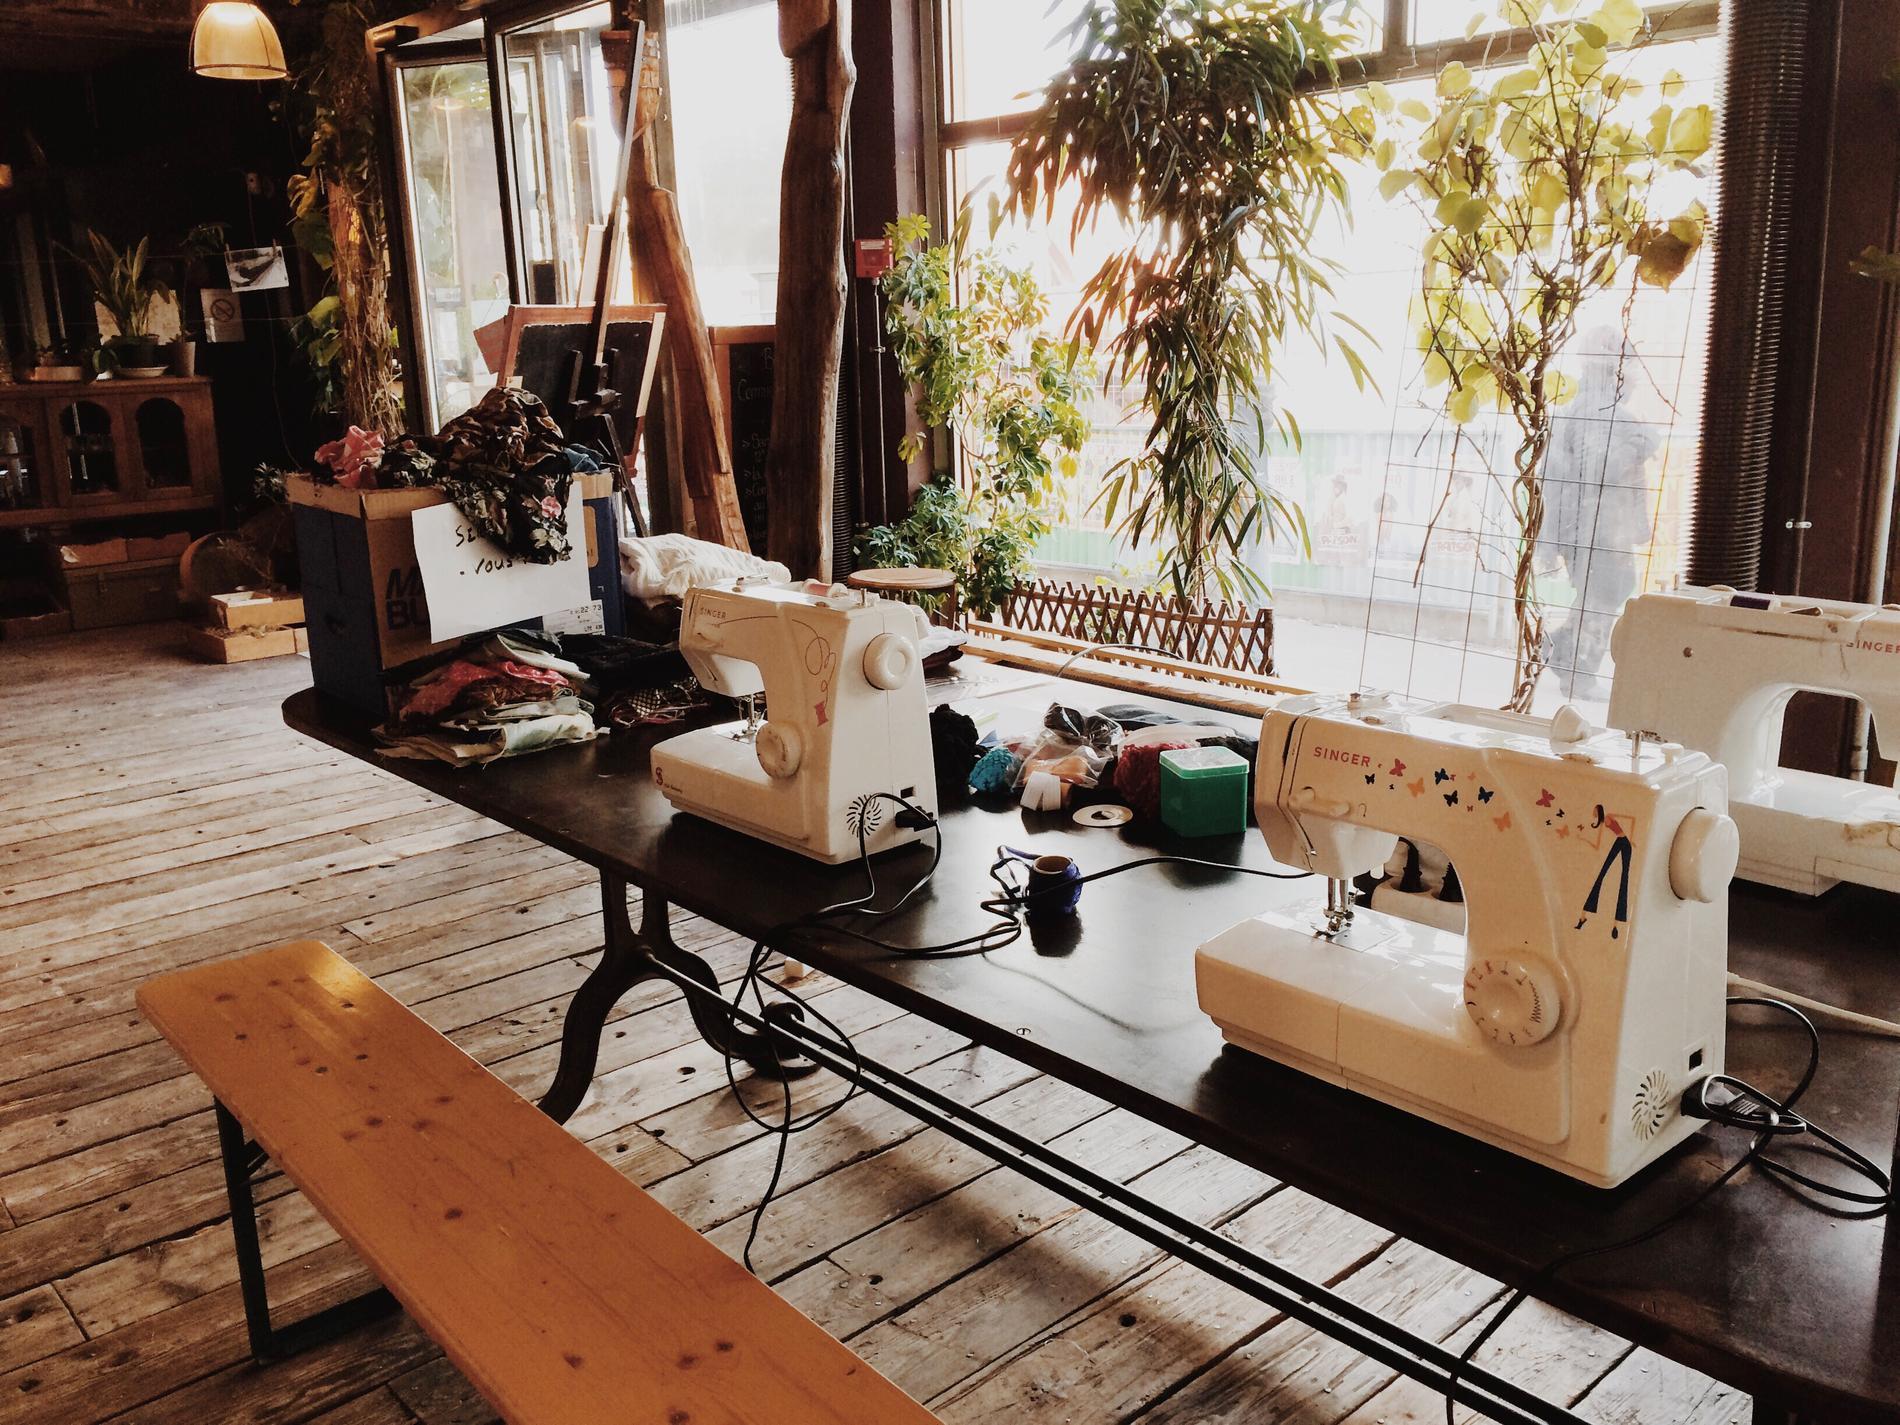 le boom des ateliers couture pour personnaliser ses v tements madame figaro. Black Bedroom Furniture Sets. Home Design Ideas